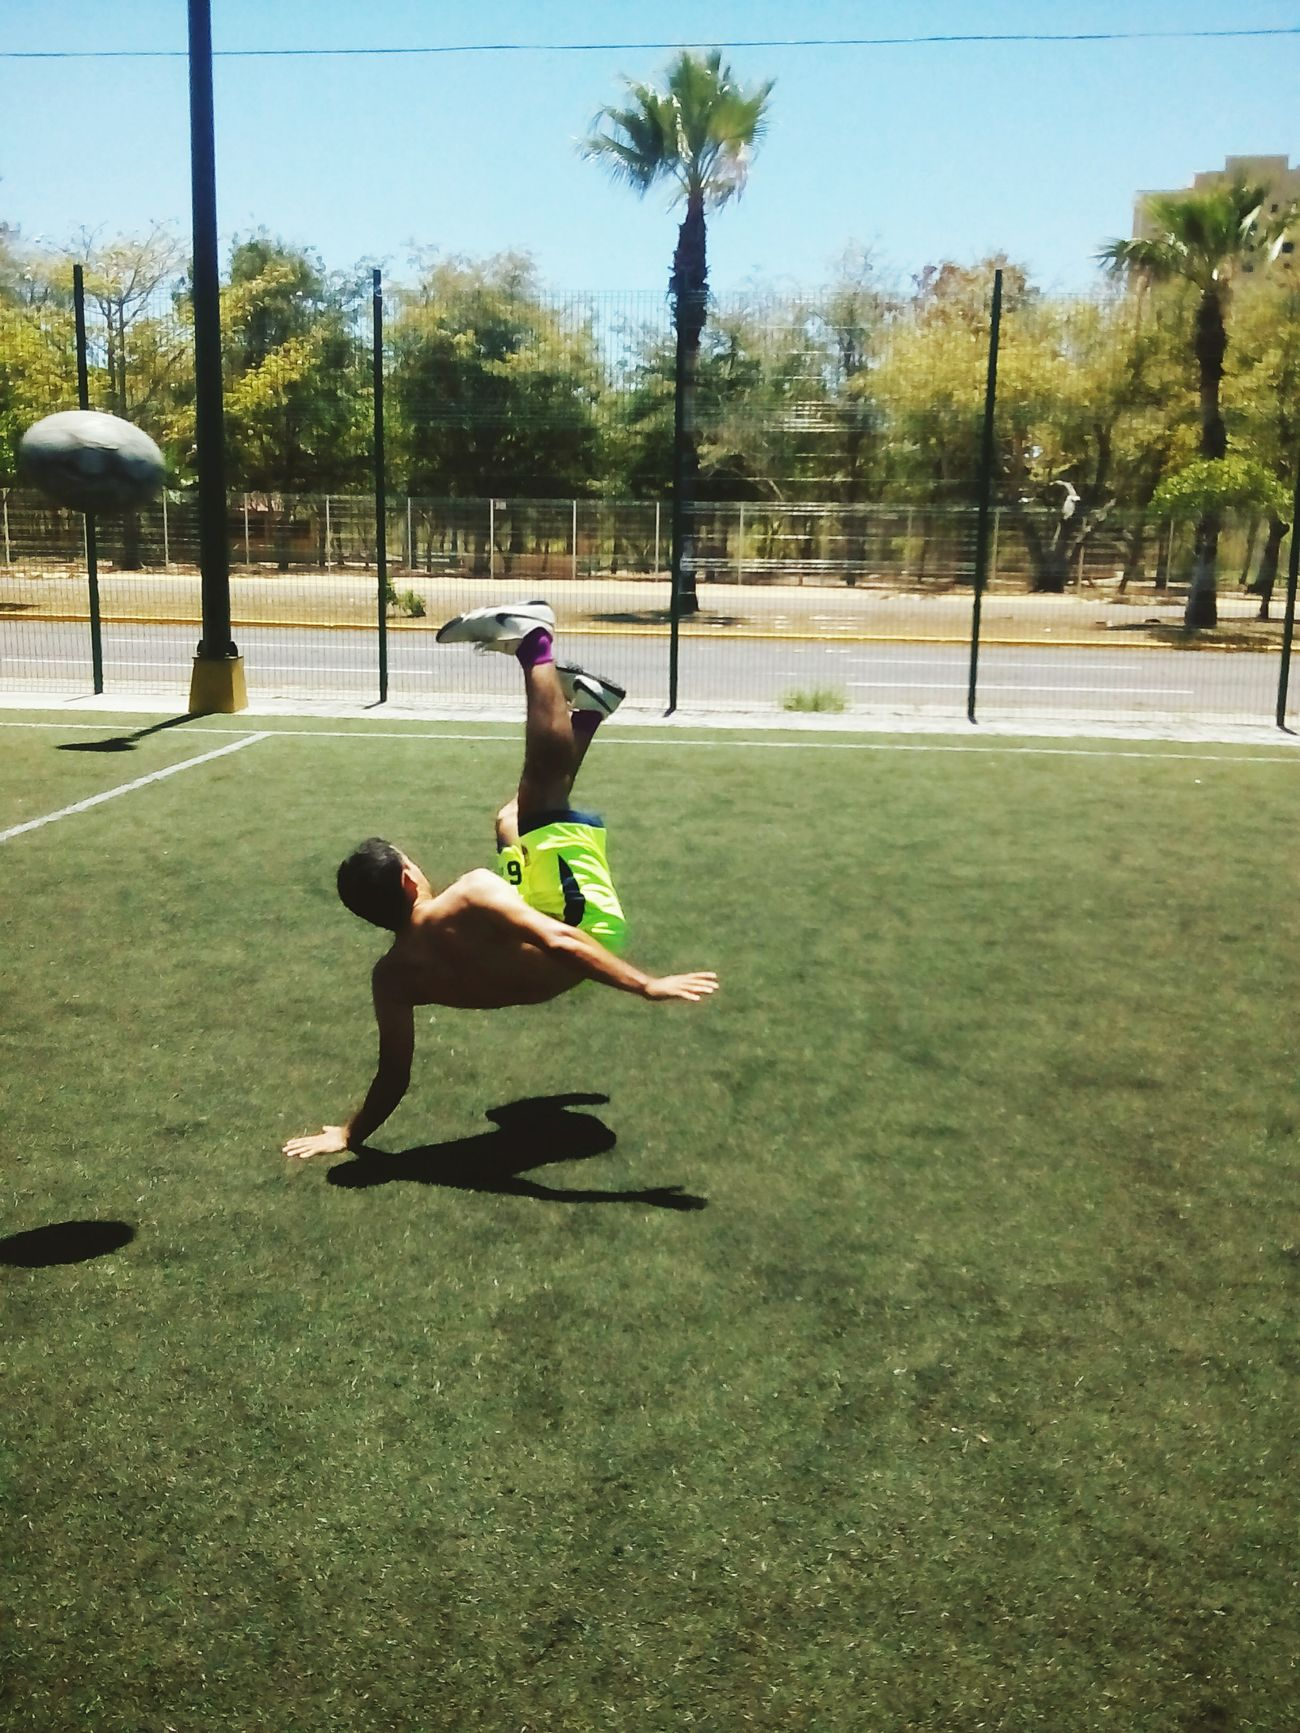 Make Magic Happen Soccer⚽ Goal Good Espectacular Futbol Chilena Grande